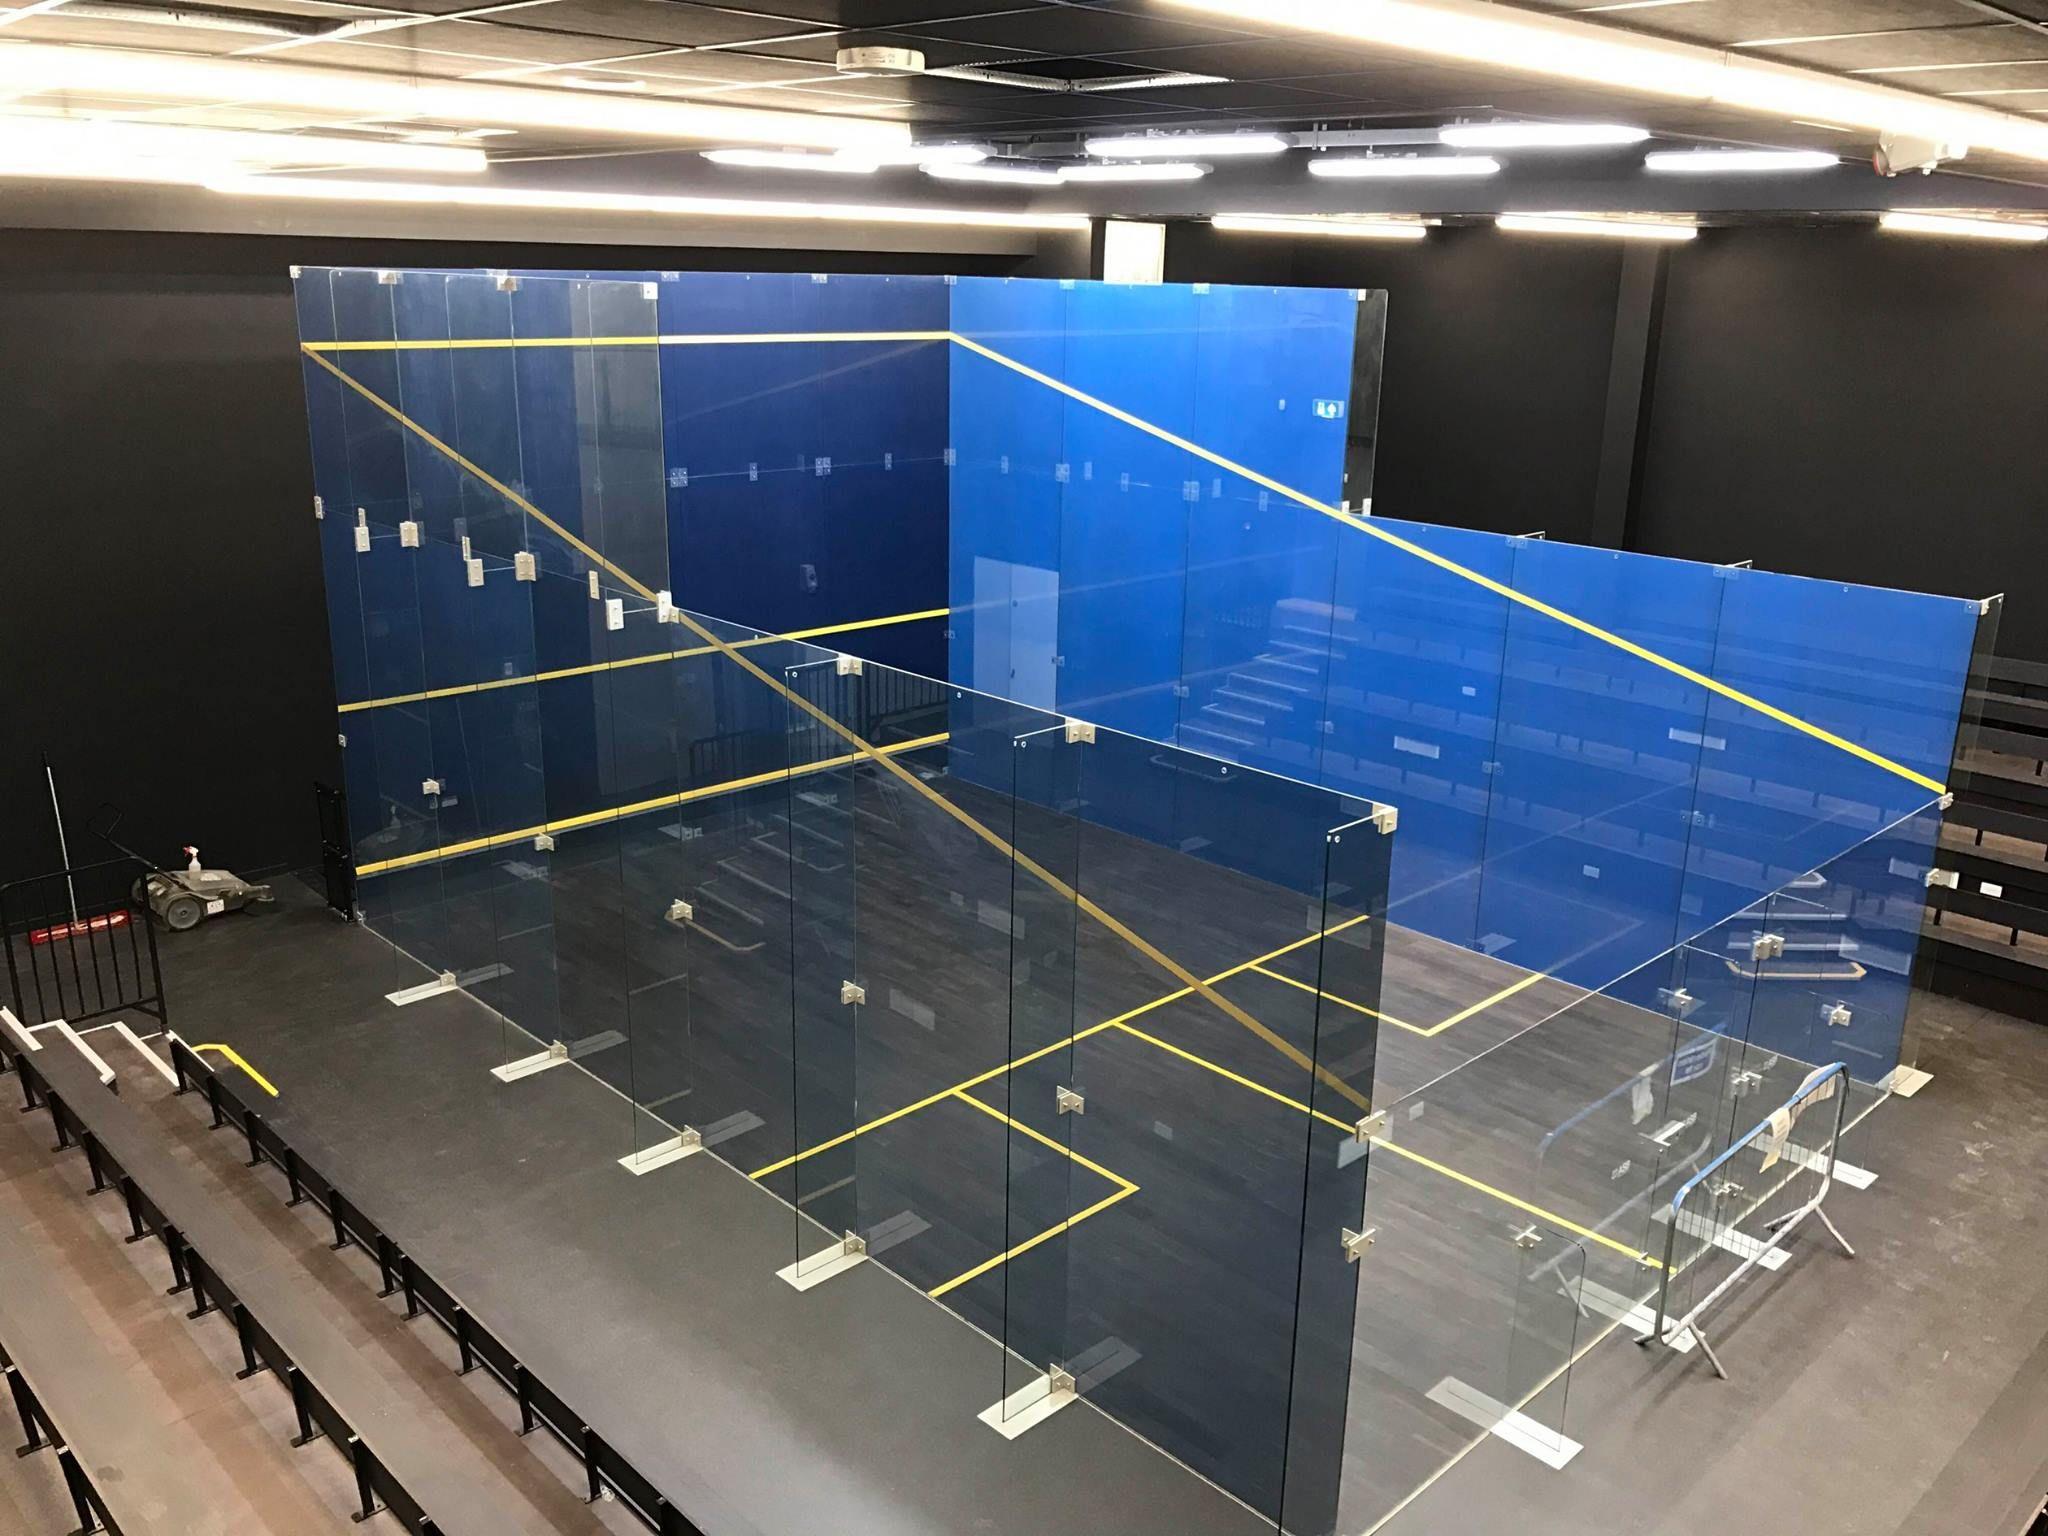 Pin by ASB Squash on ASB Courts @ University of Nottingham - David ...